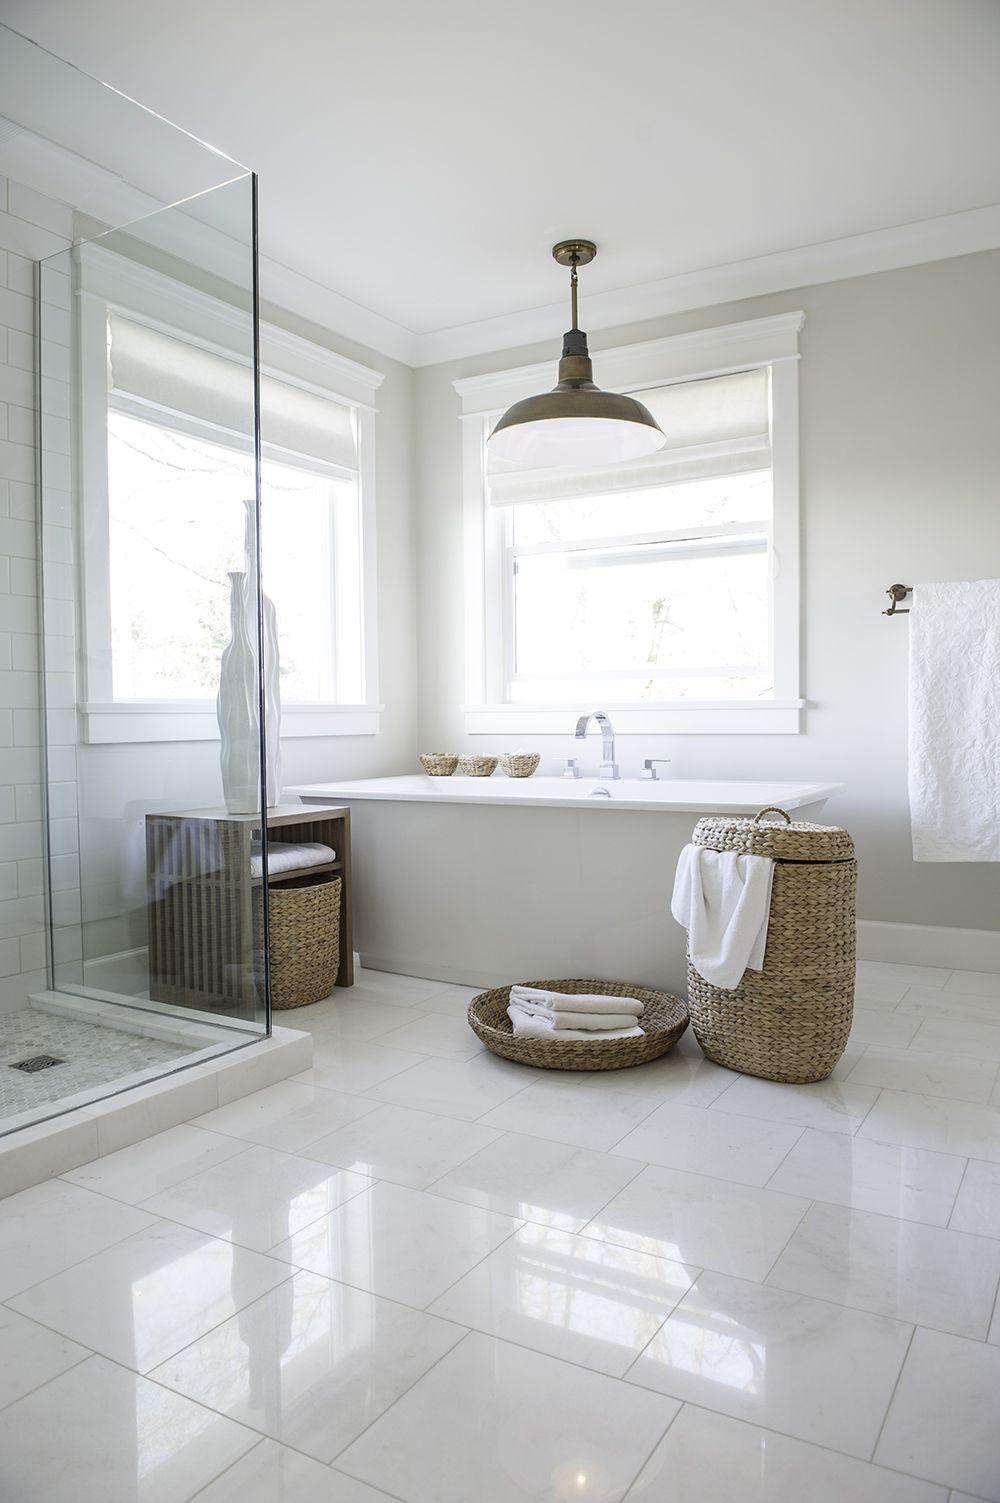 Pin by Tiffany @ Savor Home on Bathrooms | White bathroom ...